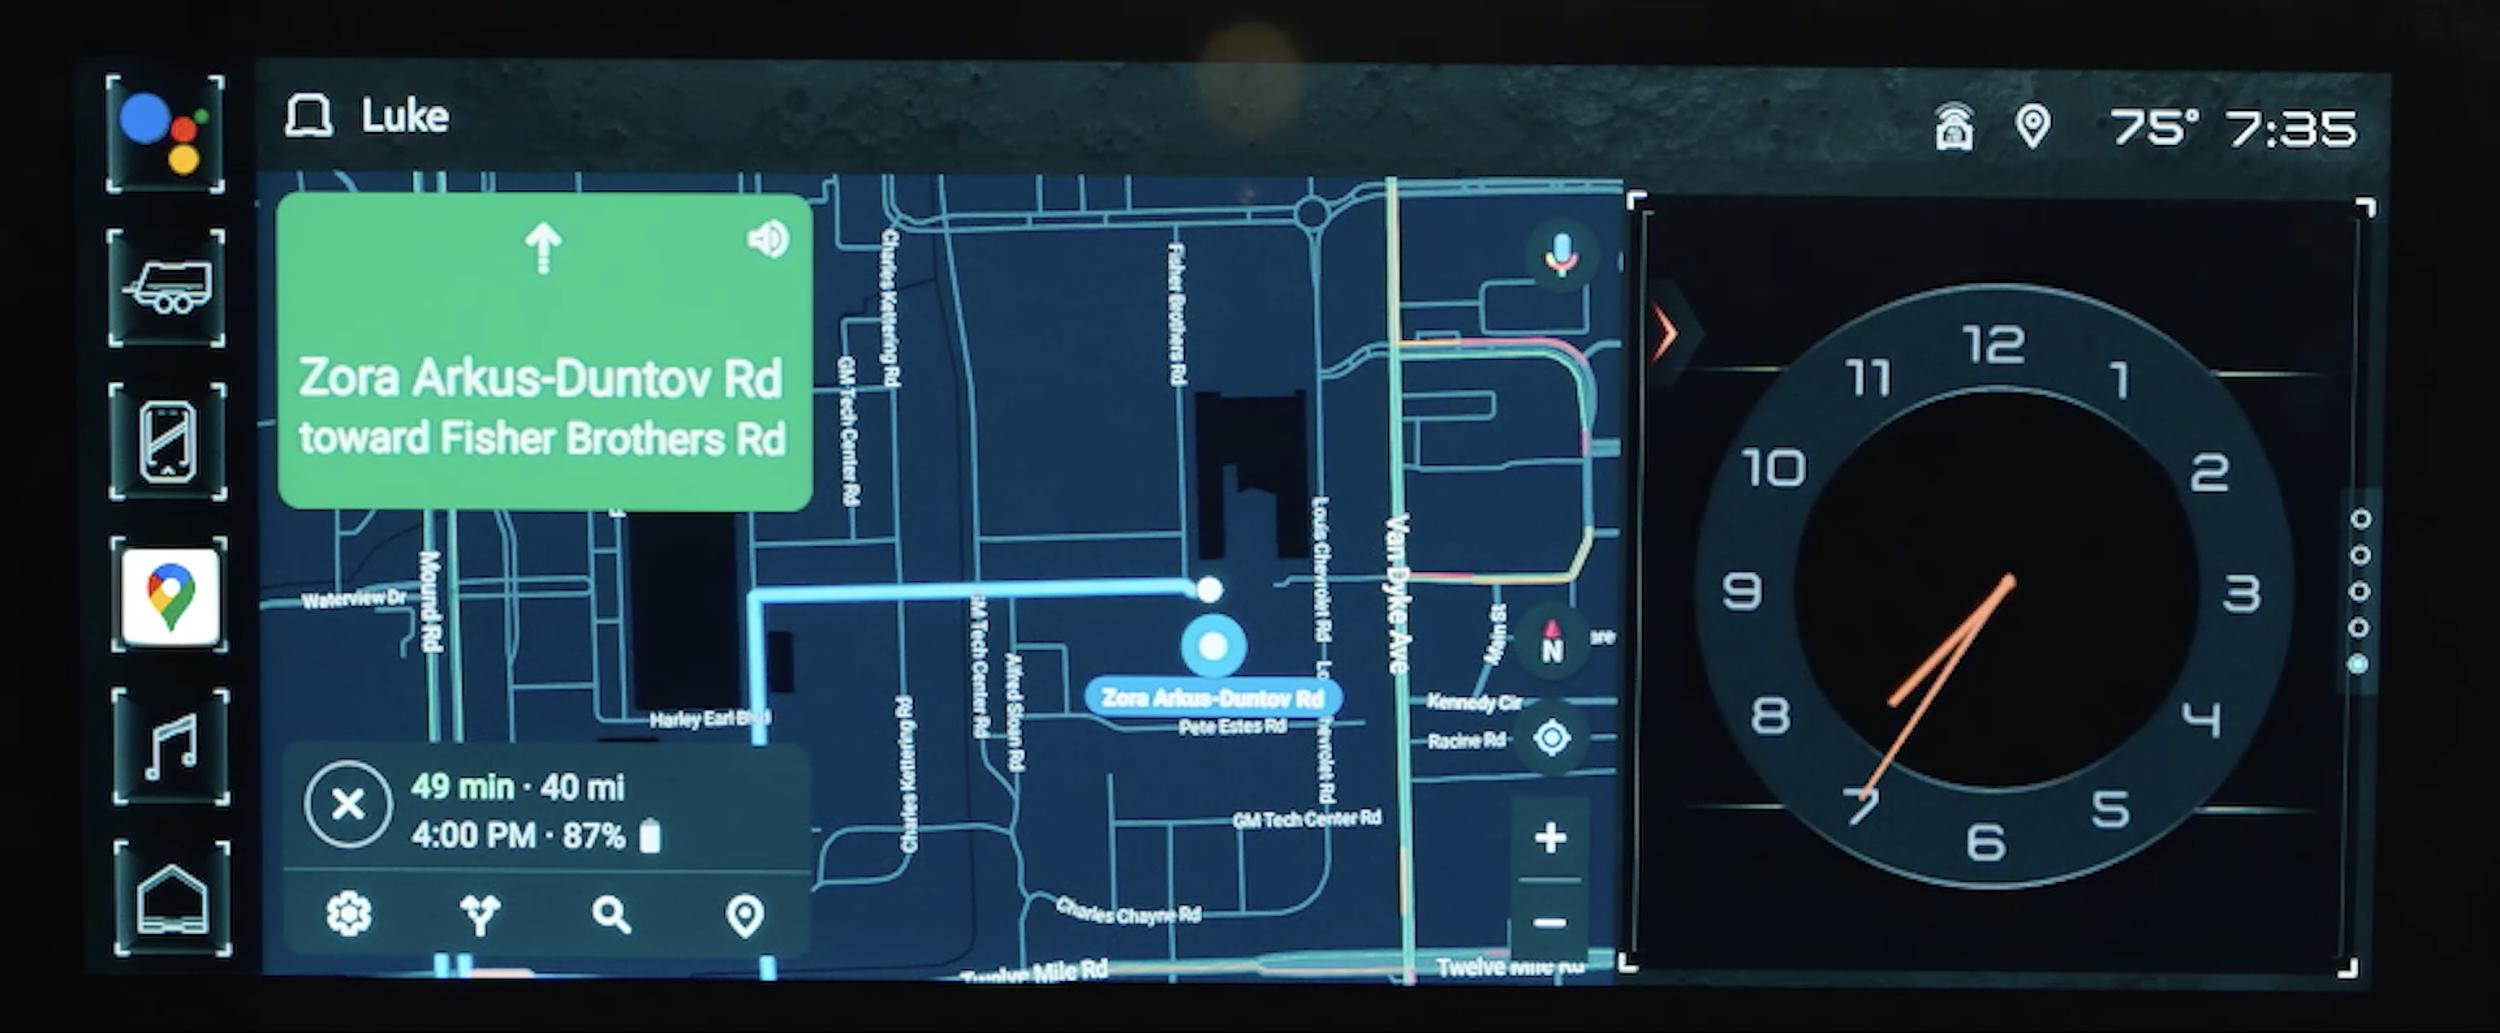 Hummer EV Android Automotive